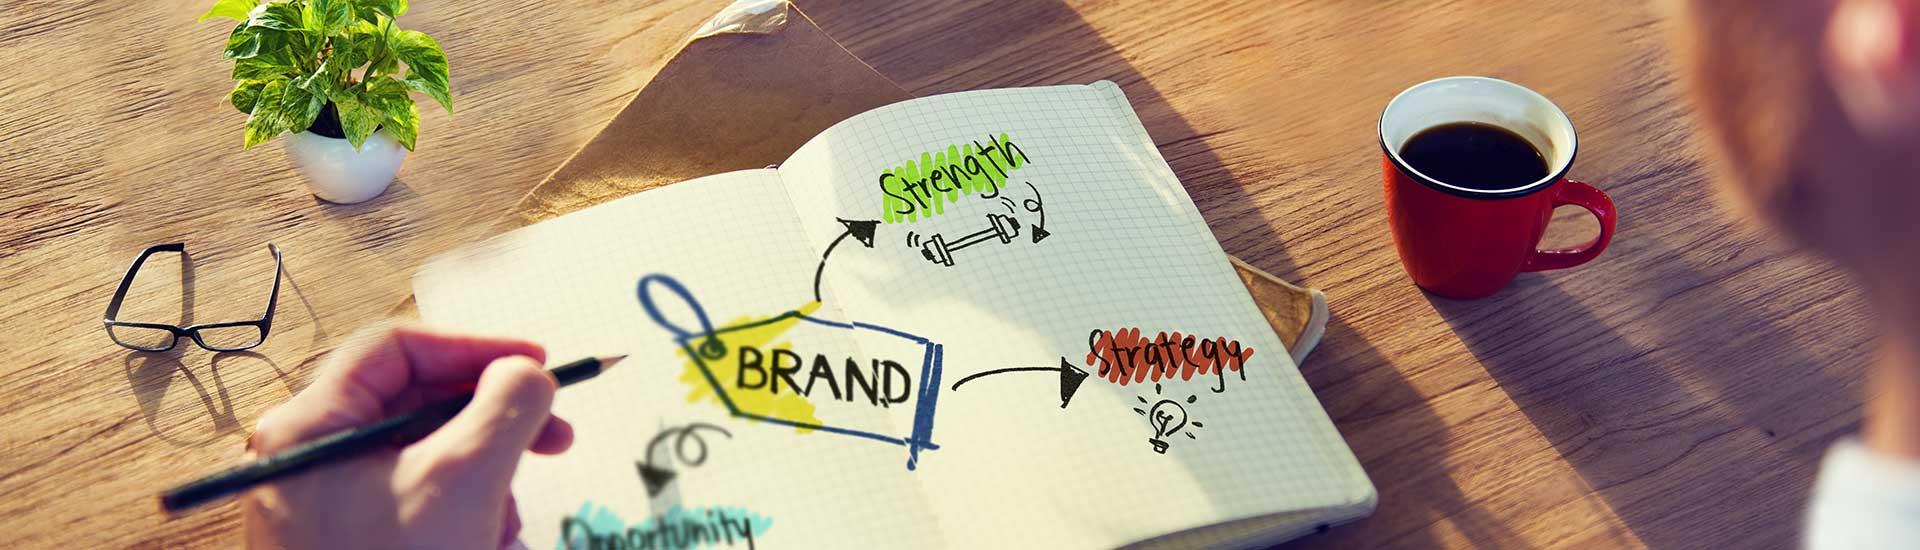 brand-management course